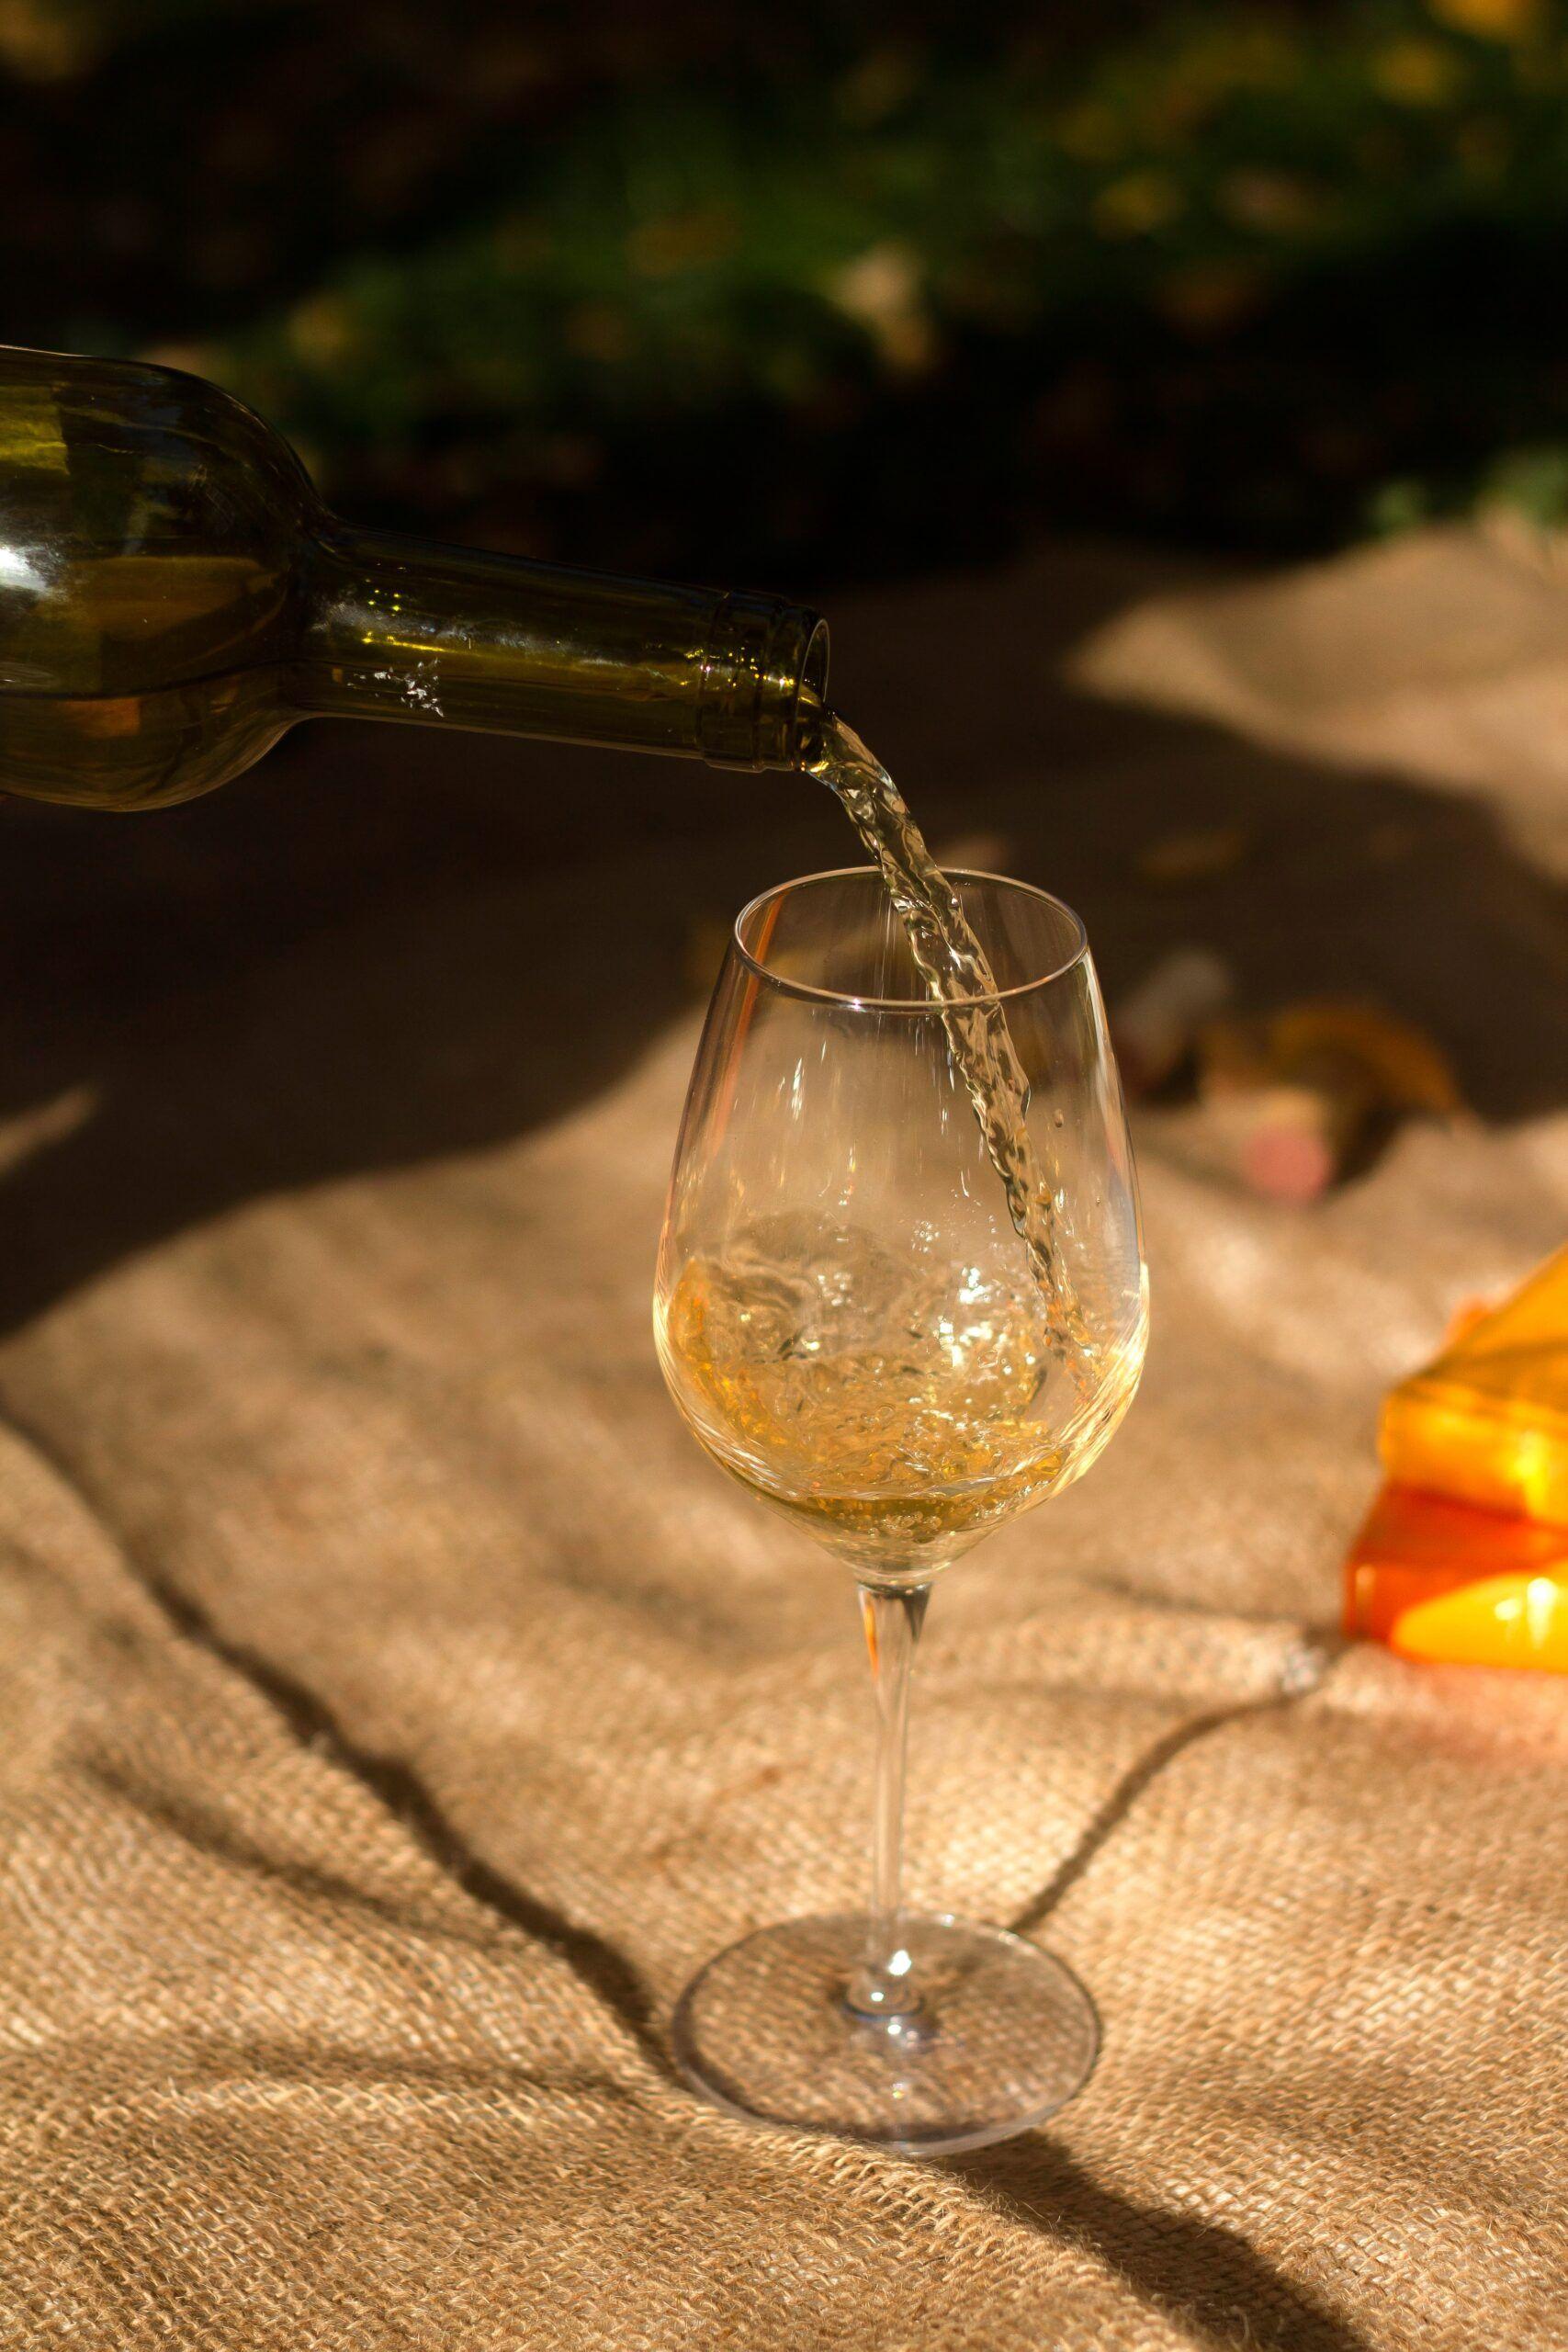 Gas carbonico vino blanco